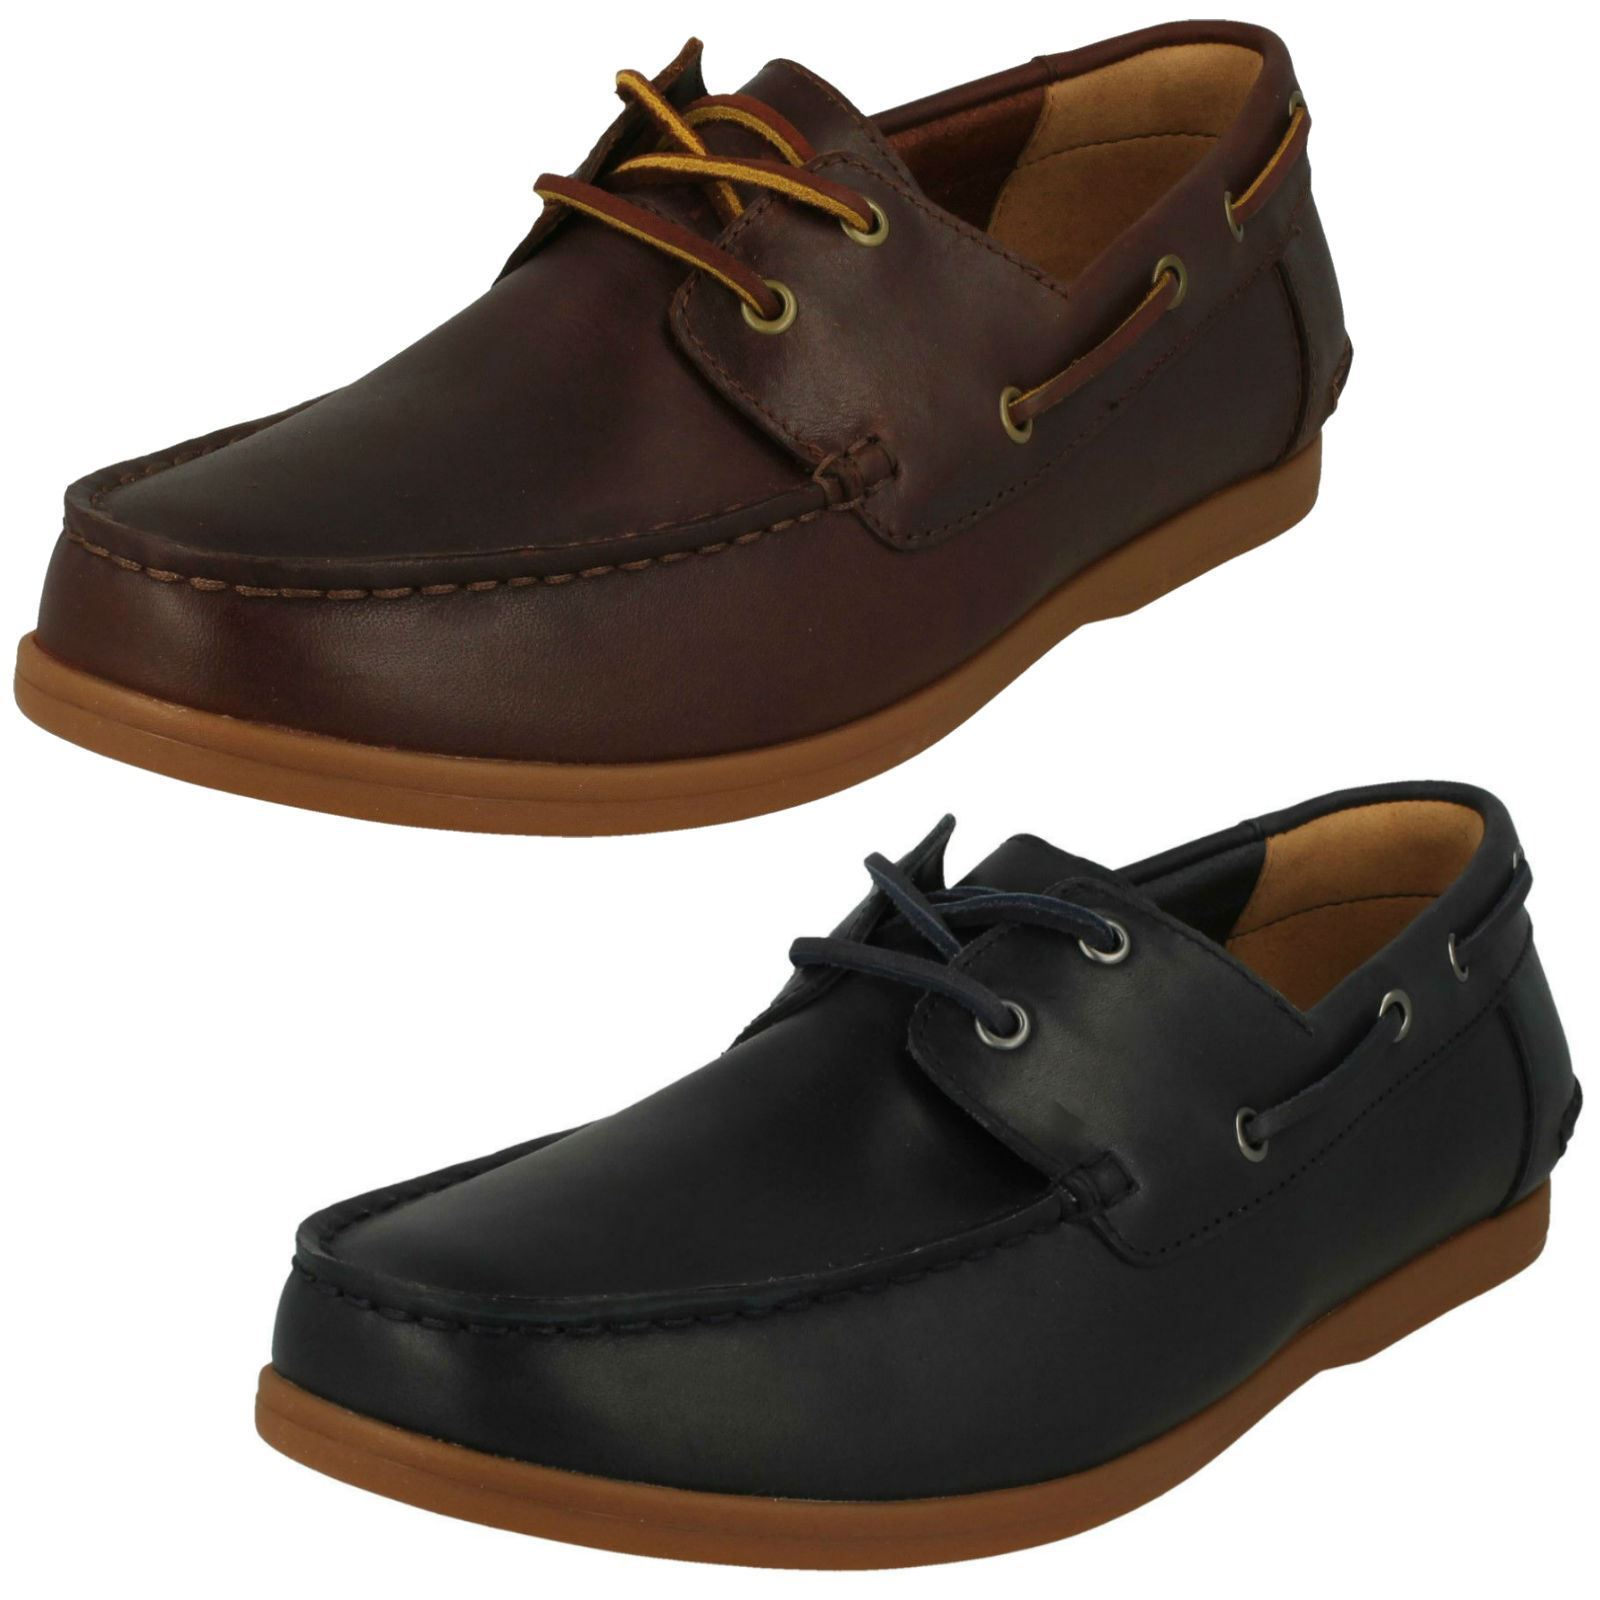 Mens Clarks Lace Up Boat Shoes Morven Sail